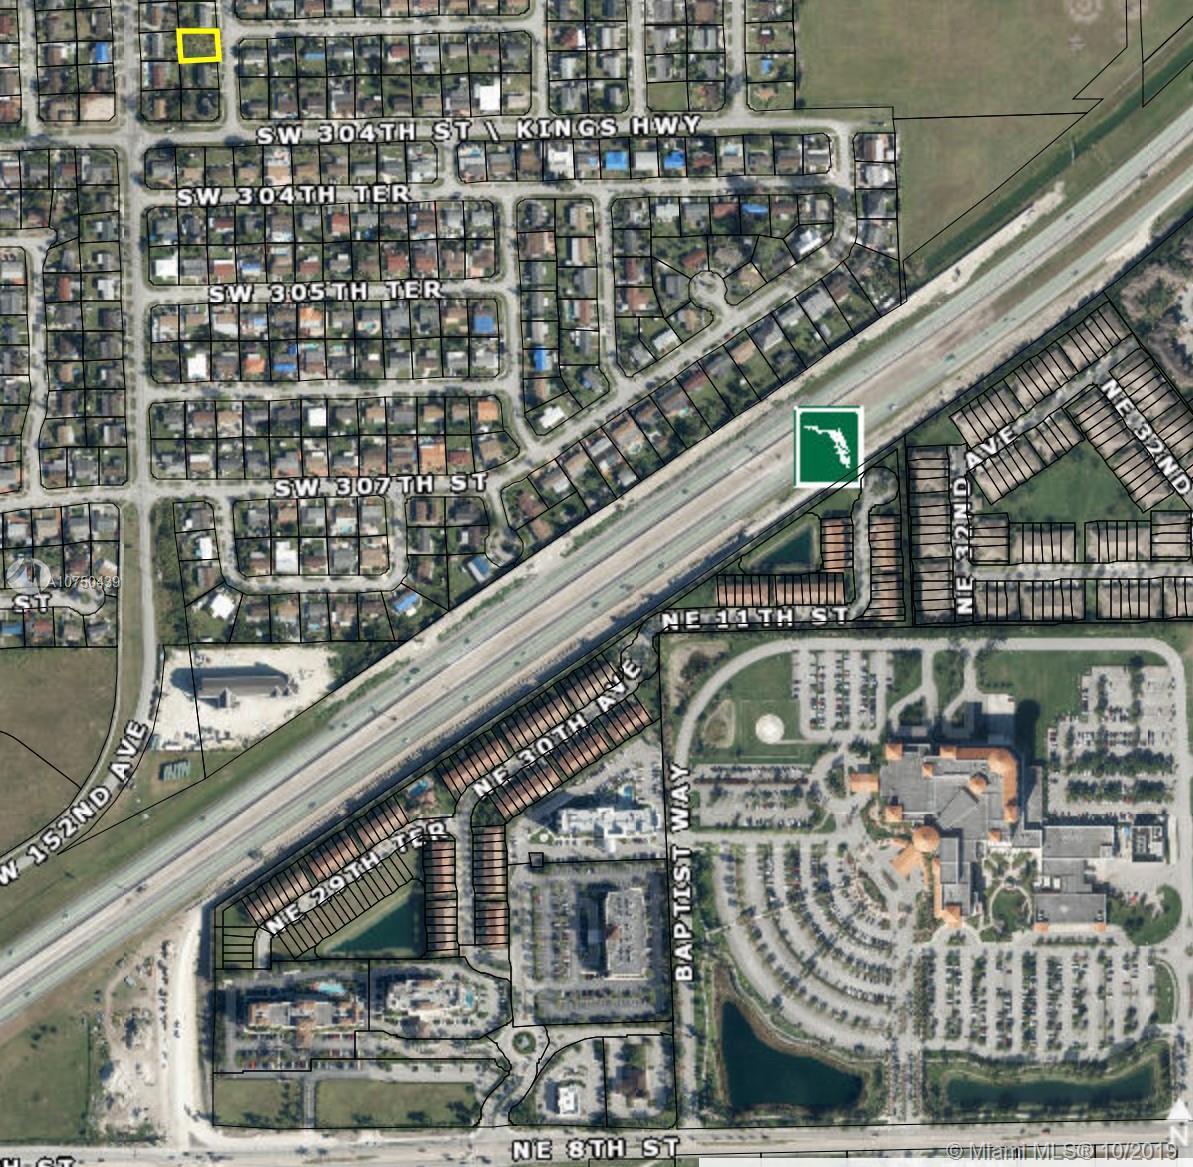 30302 151st Ave, Homestead, FL 33033 - Homestead, FL real estate listing